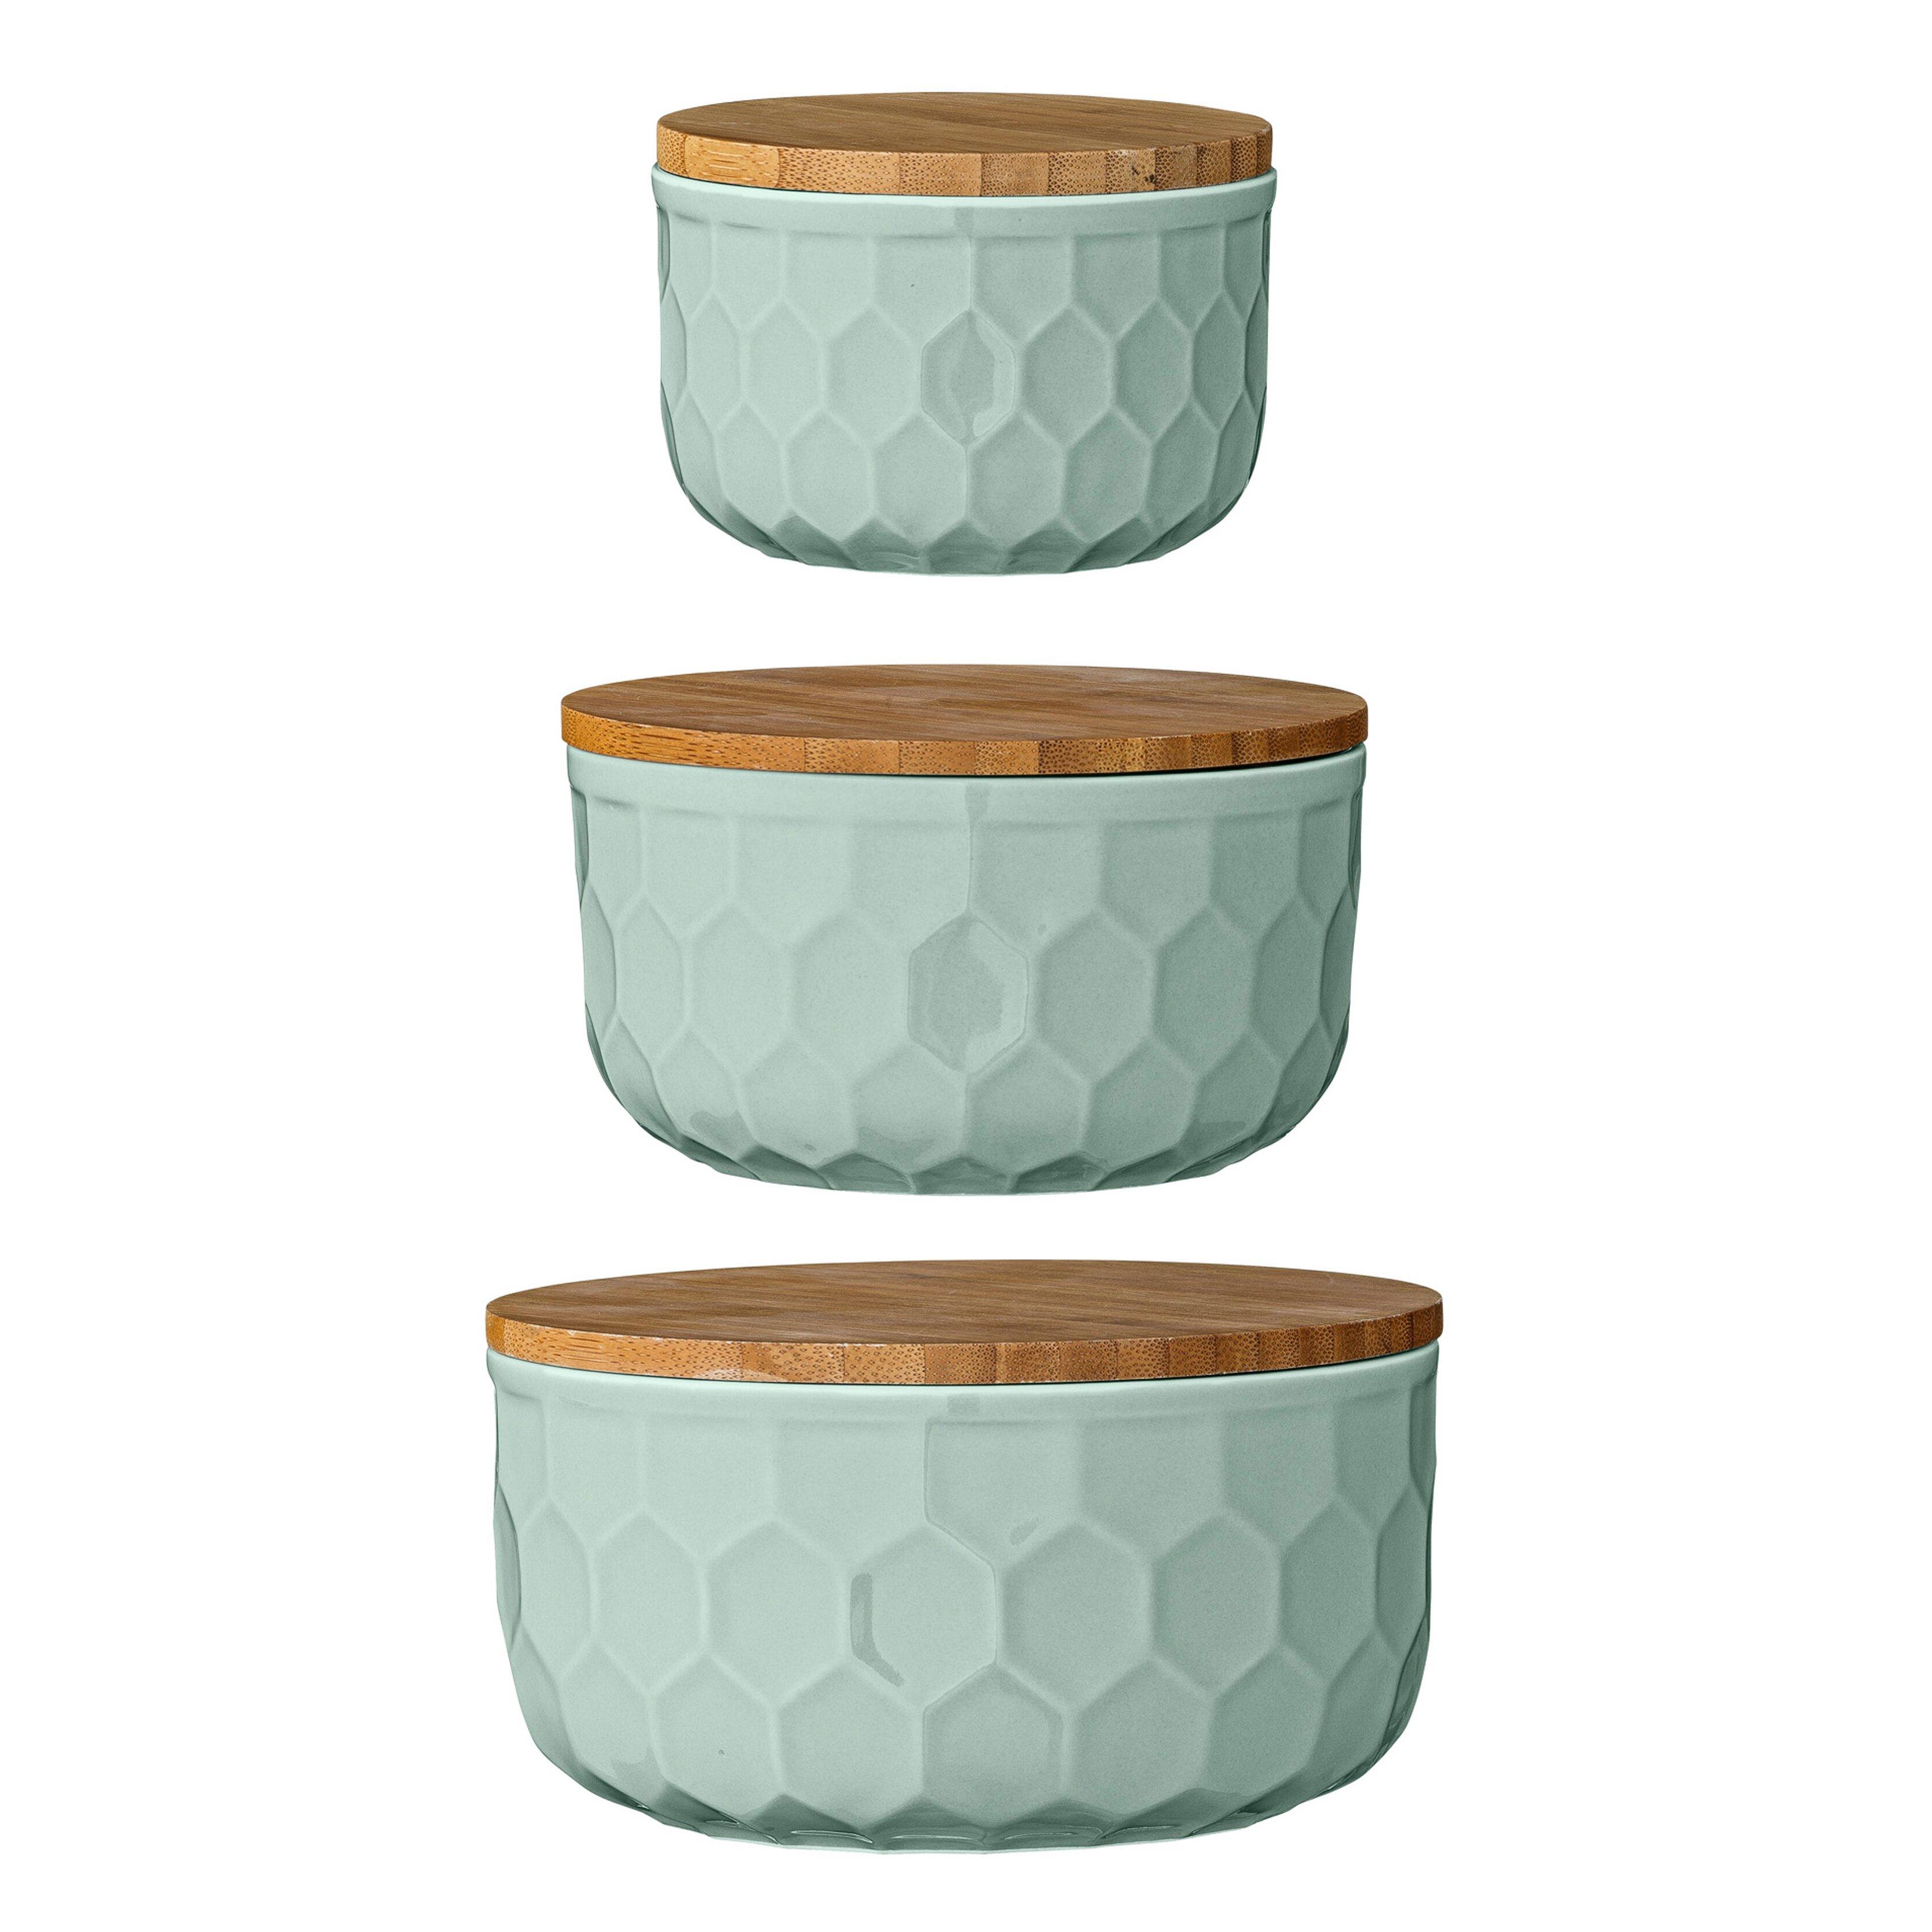 bloomingville 3 piece ceramic mixing bowl set reviews wayfair. Black Bedroom Furniture Sets. Home Design Ideas